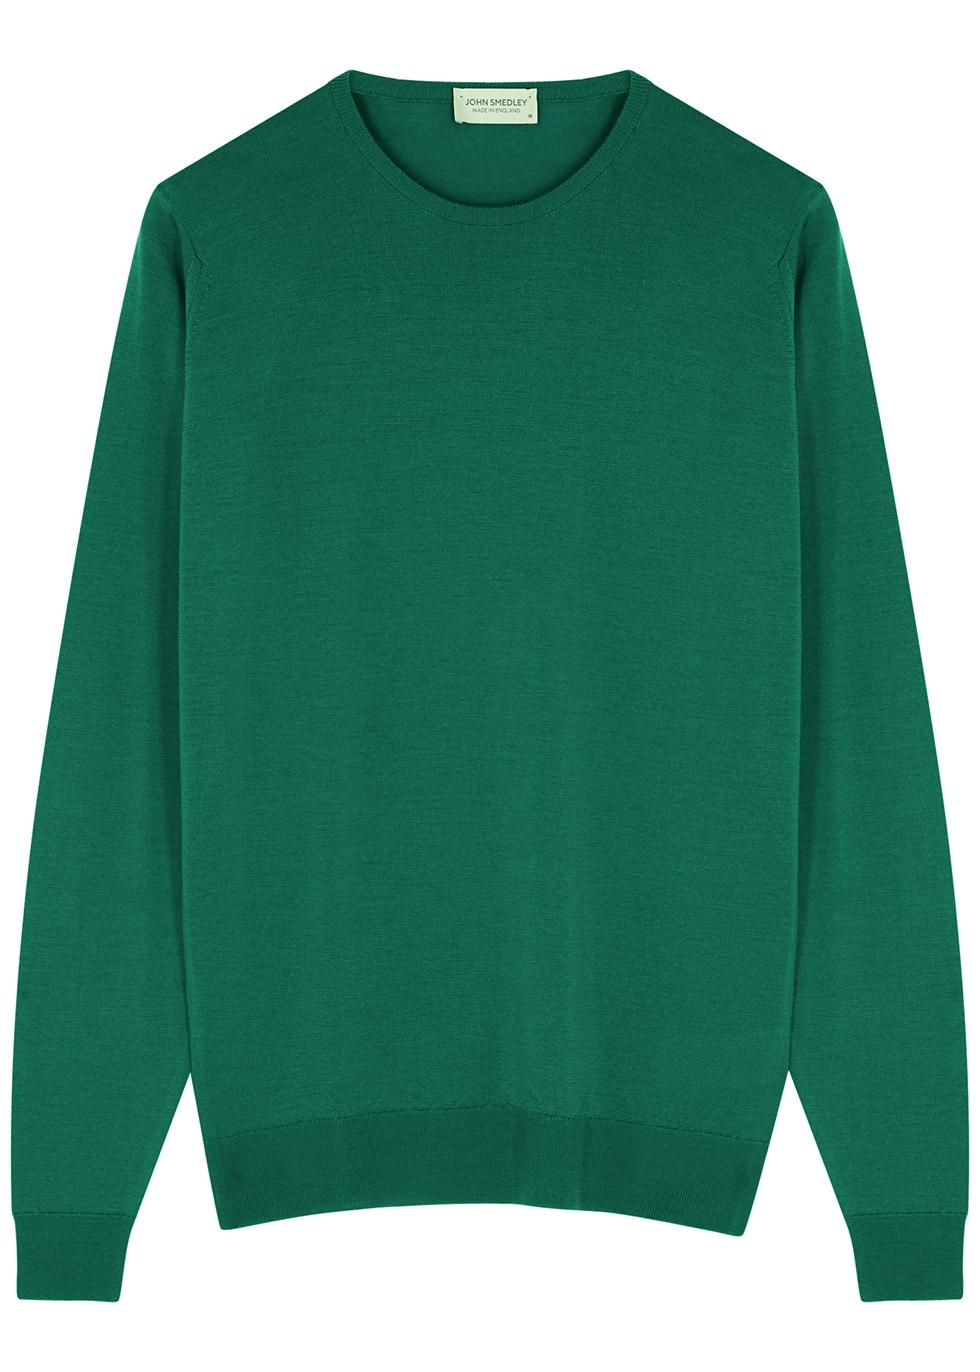 Lundy emerald merino wool jumper